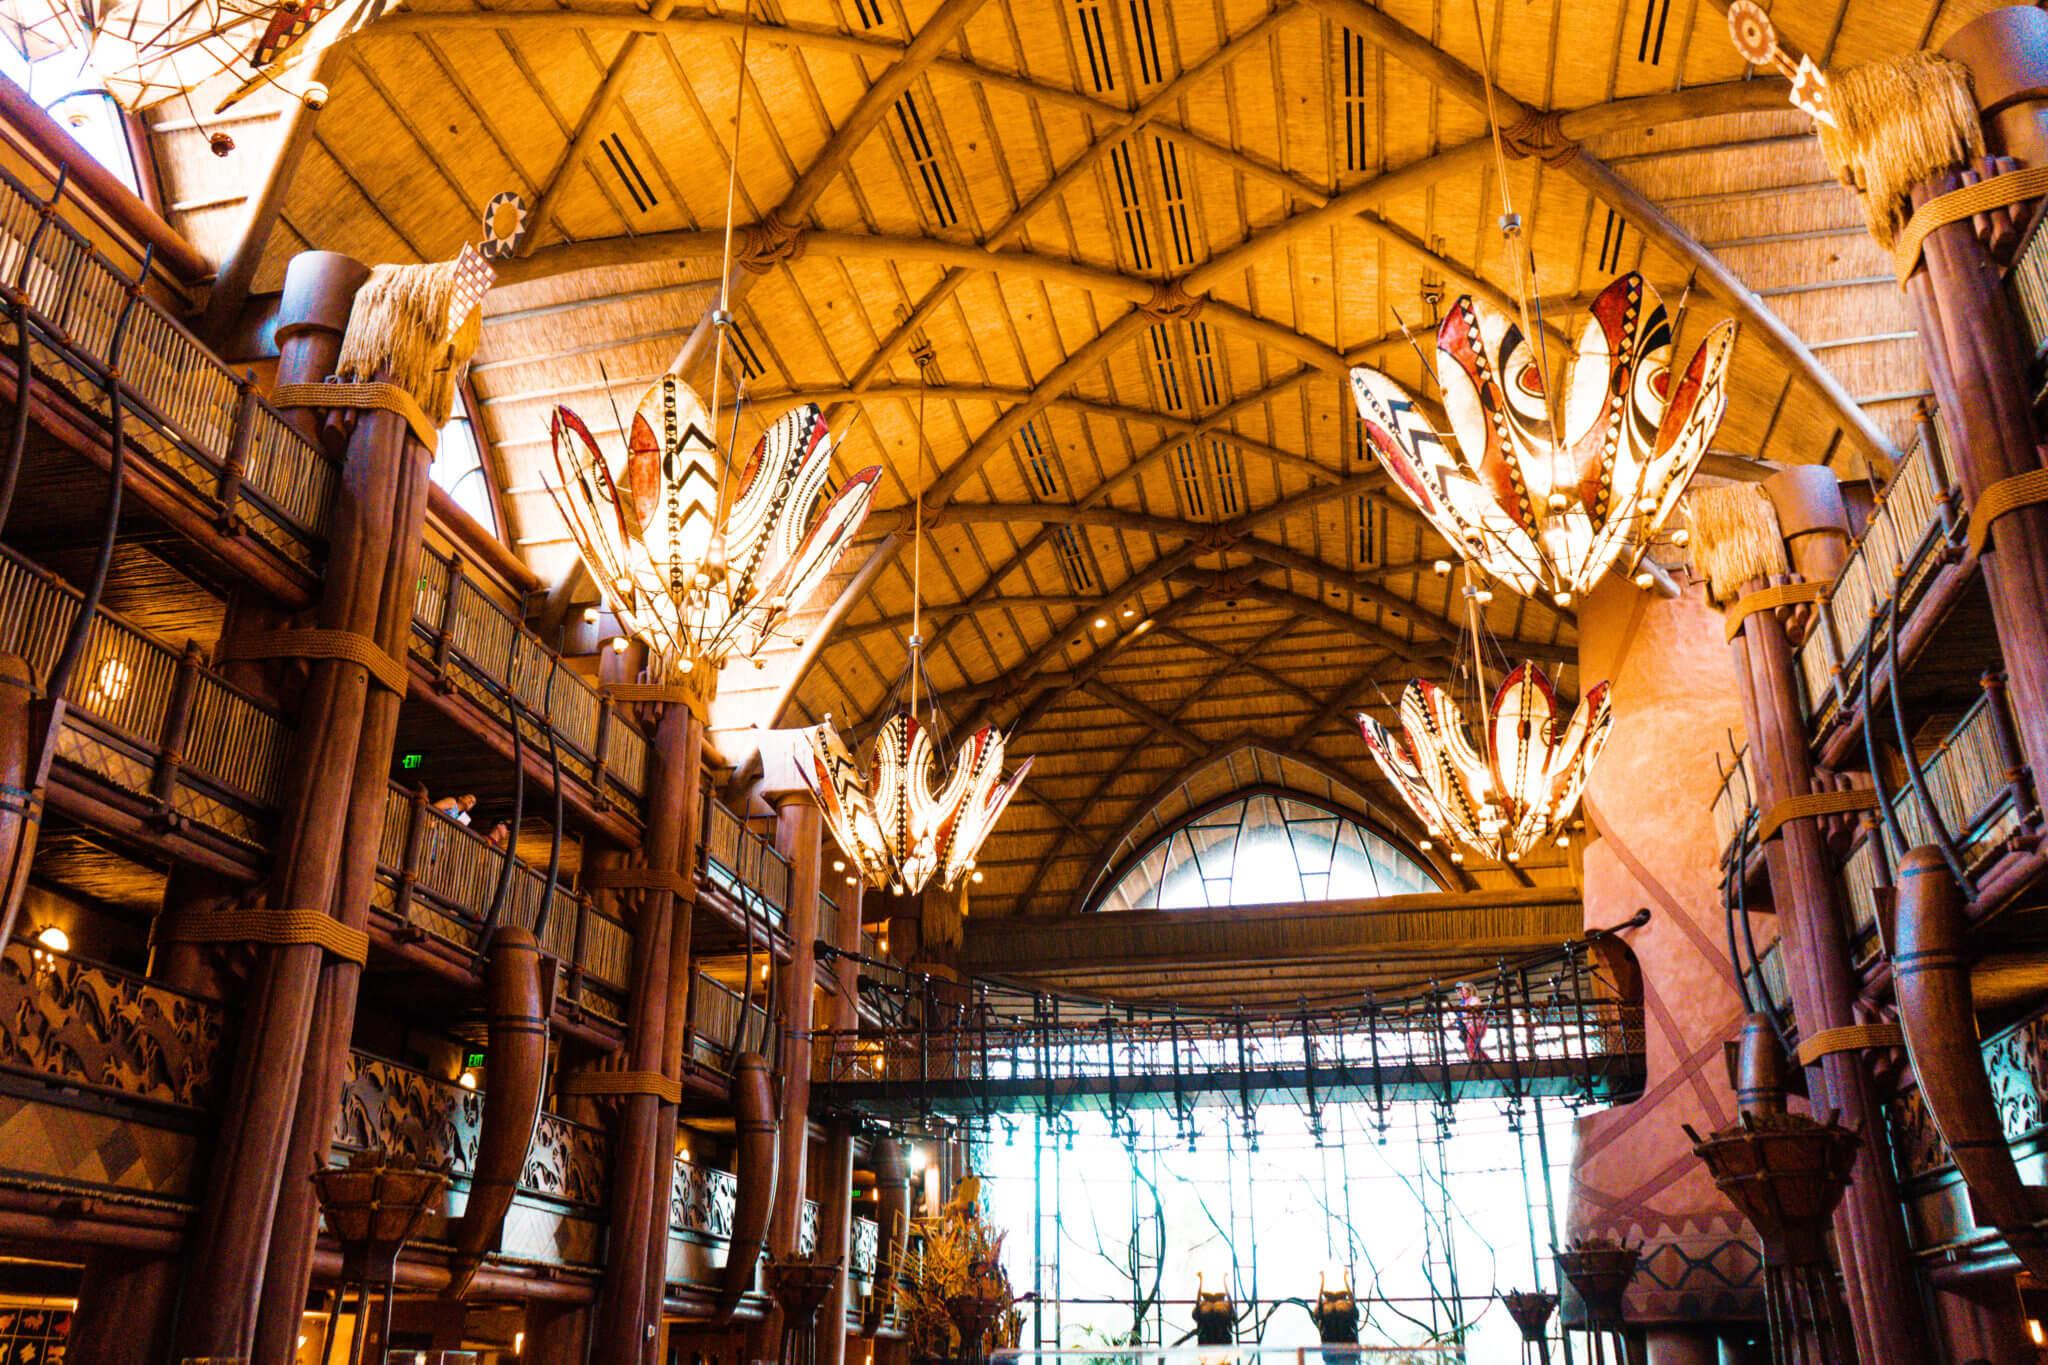 Warmly lit Animal Kingdom Lodge lobby and chandeliers at Disney World